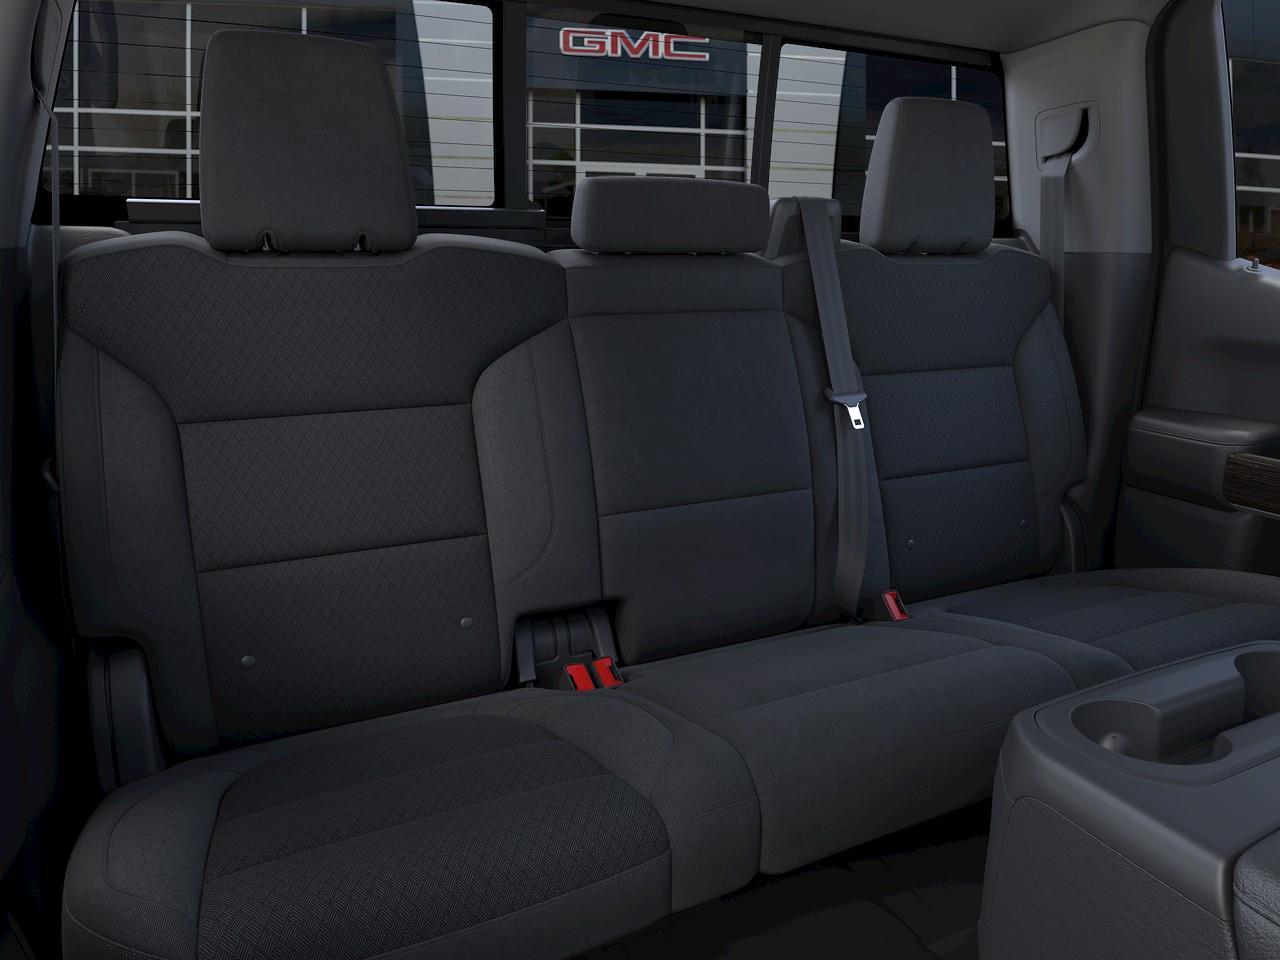 2021 Sierra 1500 Double Cab 4x4,  Pickup #C2946 - photo 13